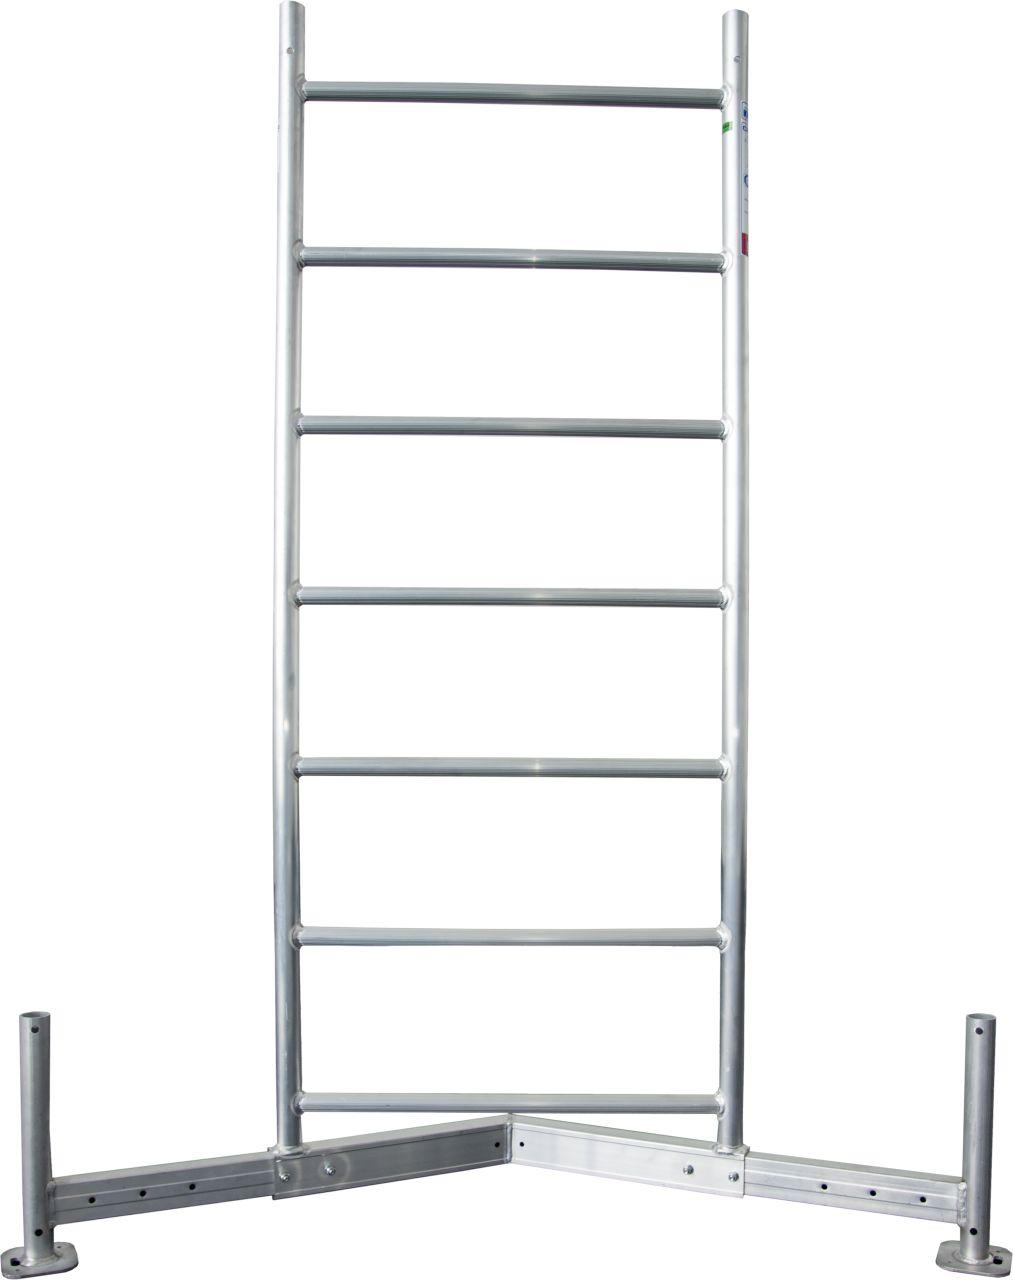 Krause Vertikalrahmen 1,00 x 0,65 m